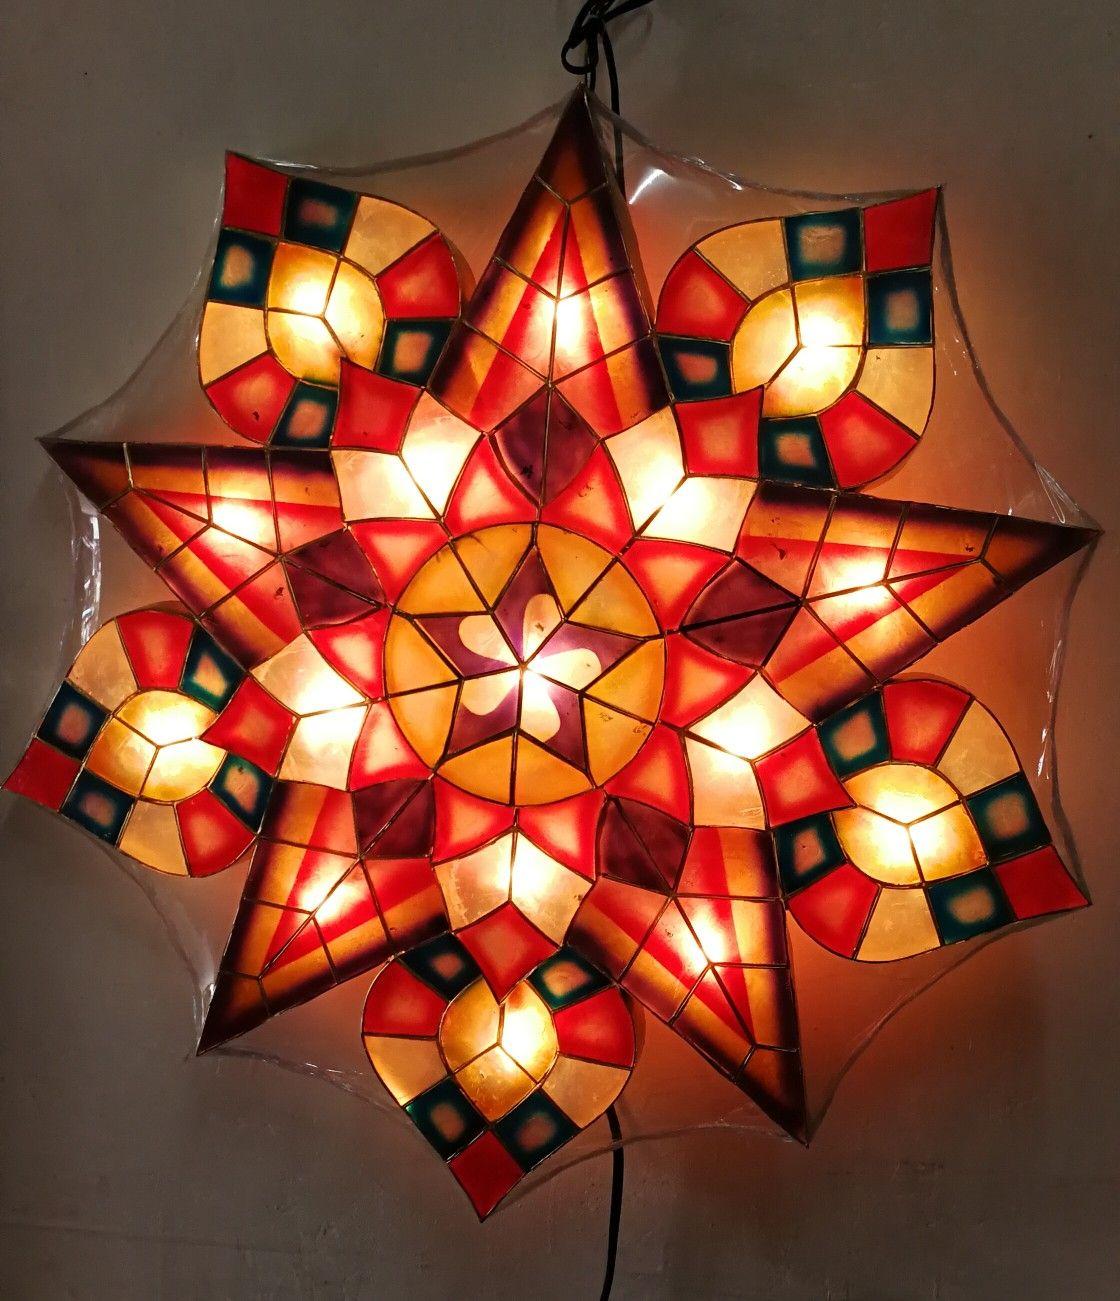 Stariray Parol Special Star And Spade Design Capiz Philippine